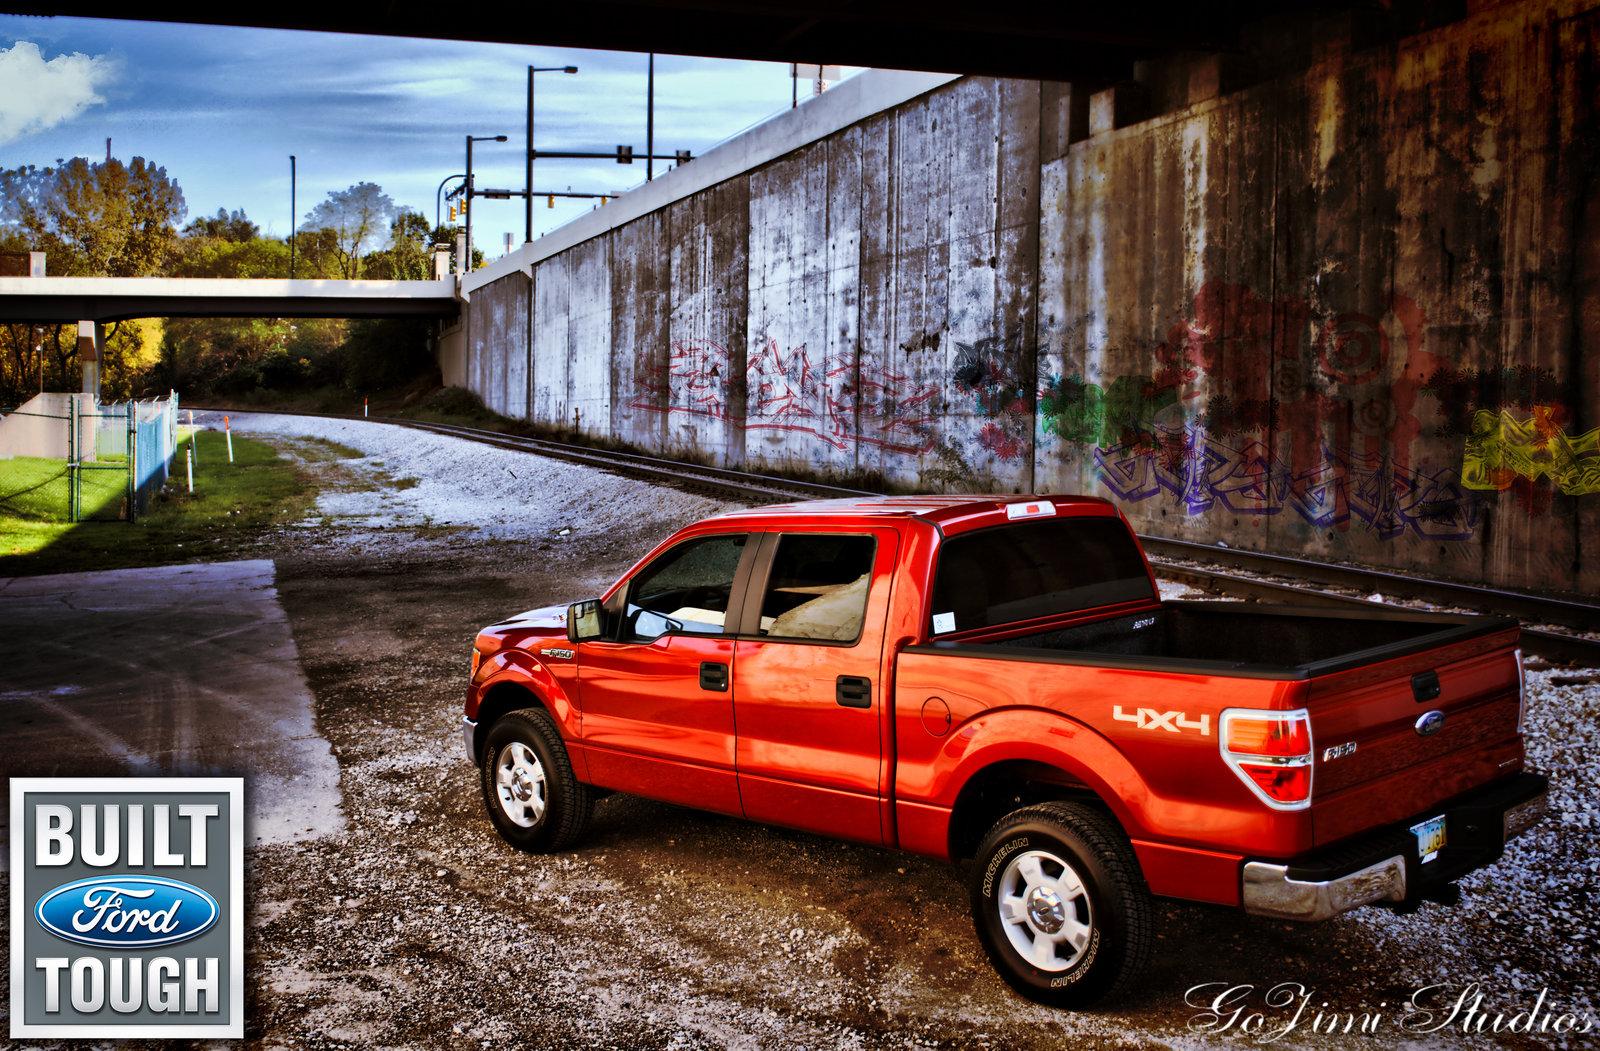 Built Ford Tough Wallpaper wwwpixsharkcom   Images 1600x1051